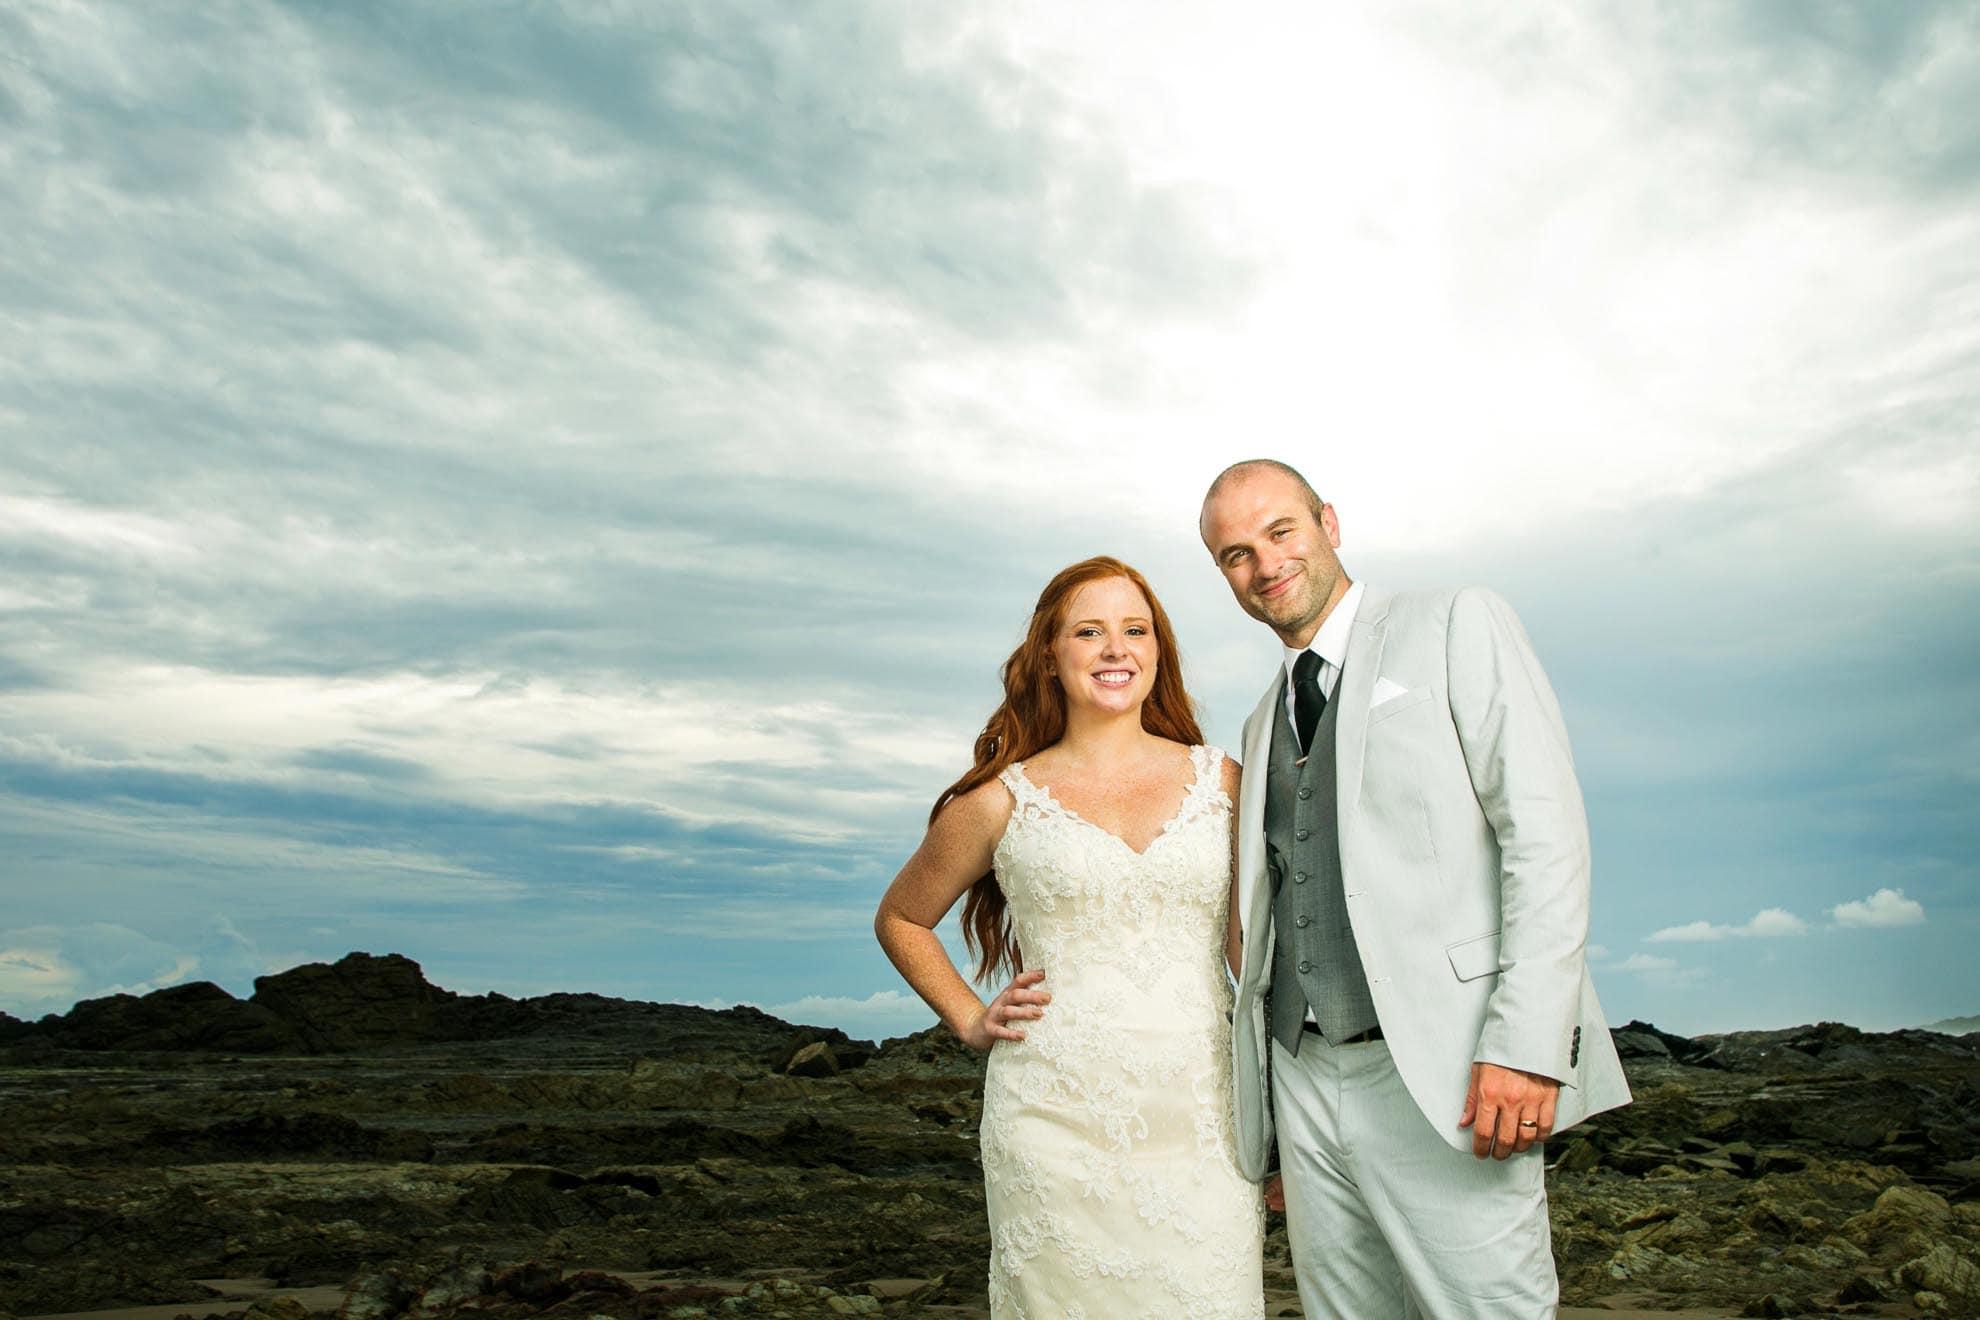 Dominical wedding photographer